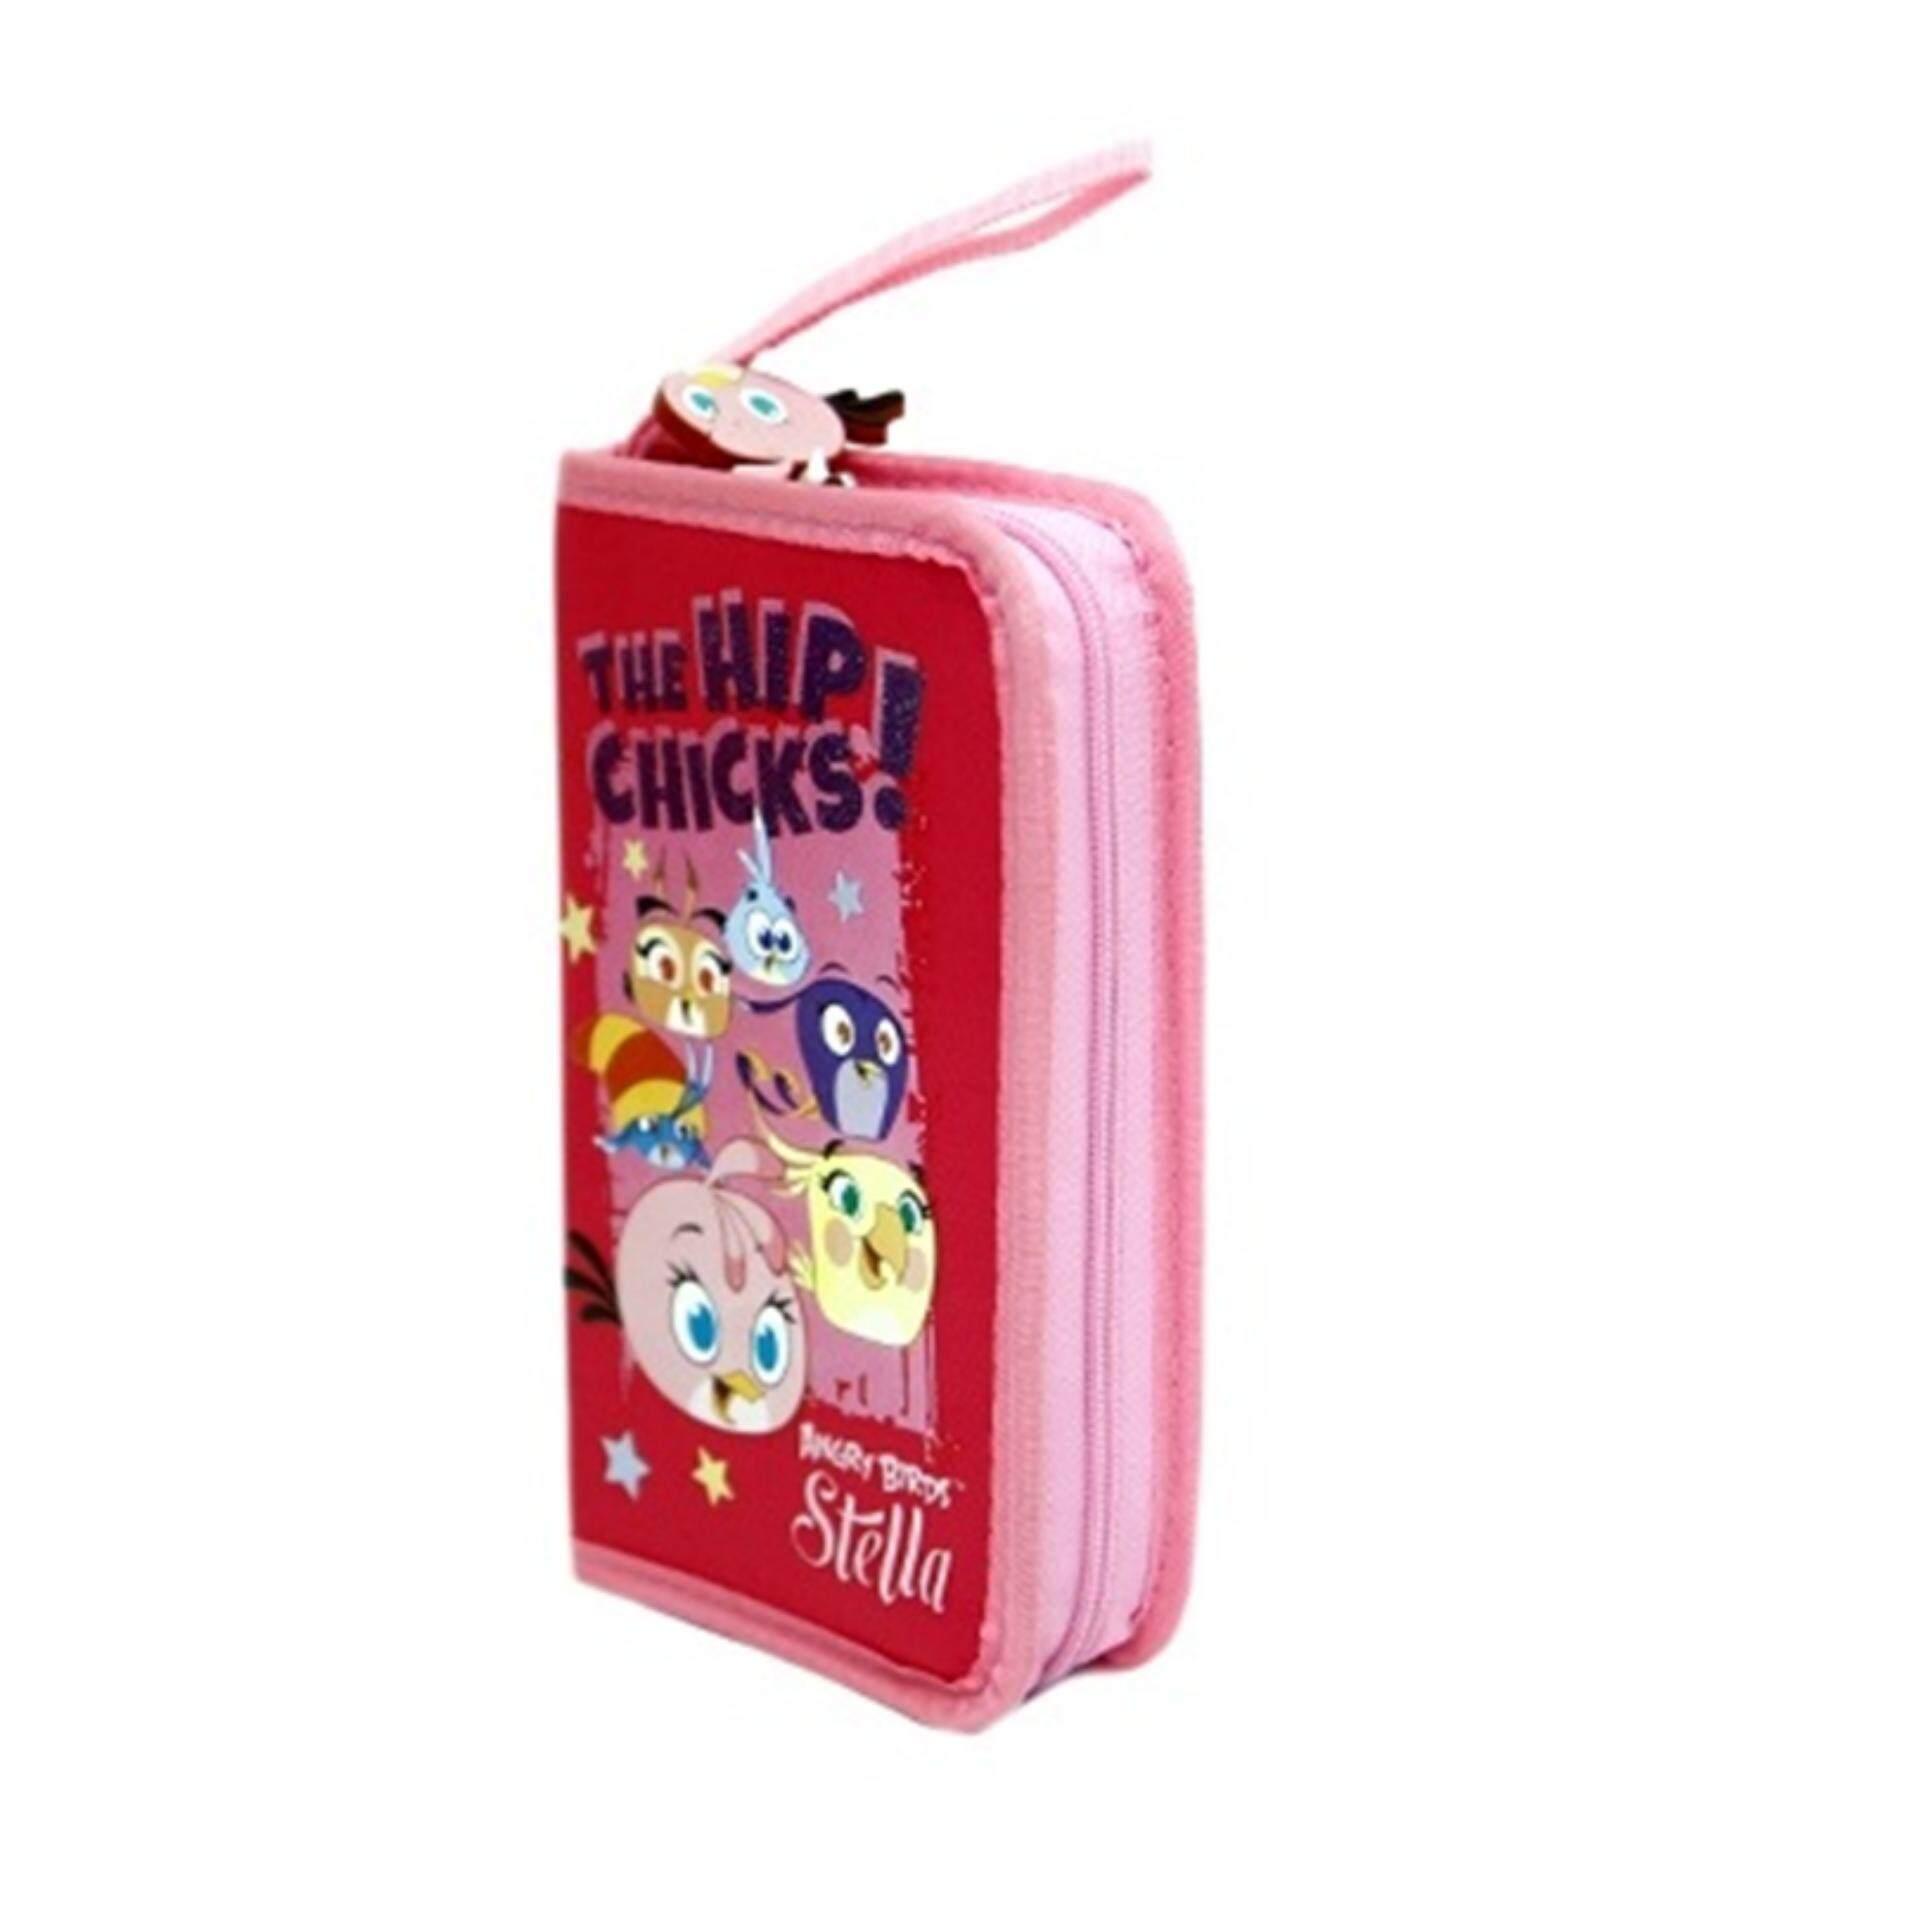 Angry Birds Stella 3 Folded Organiser Set - Pink Colour